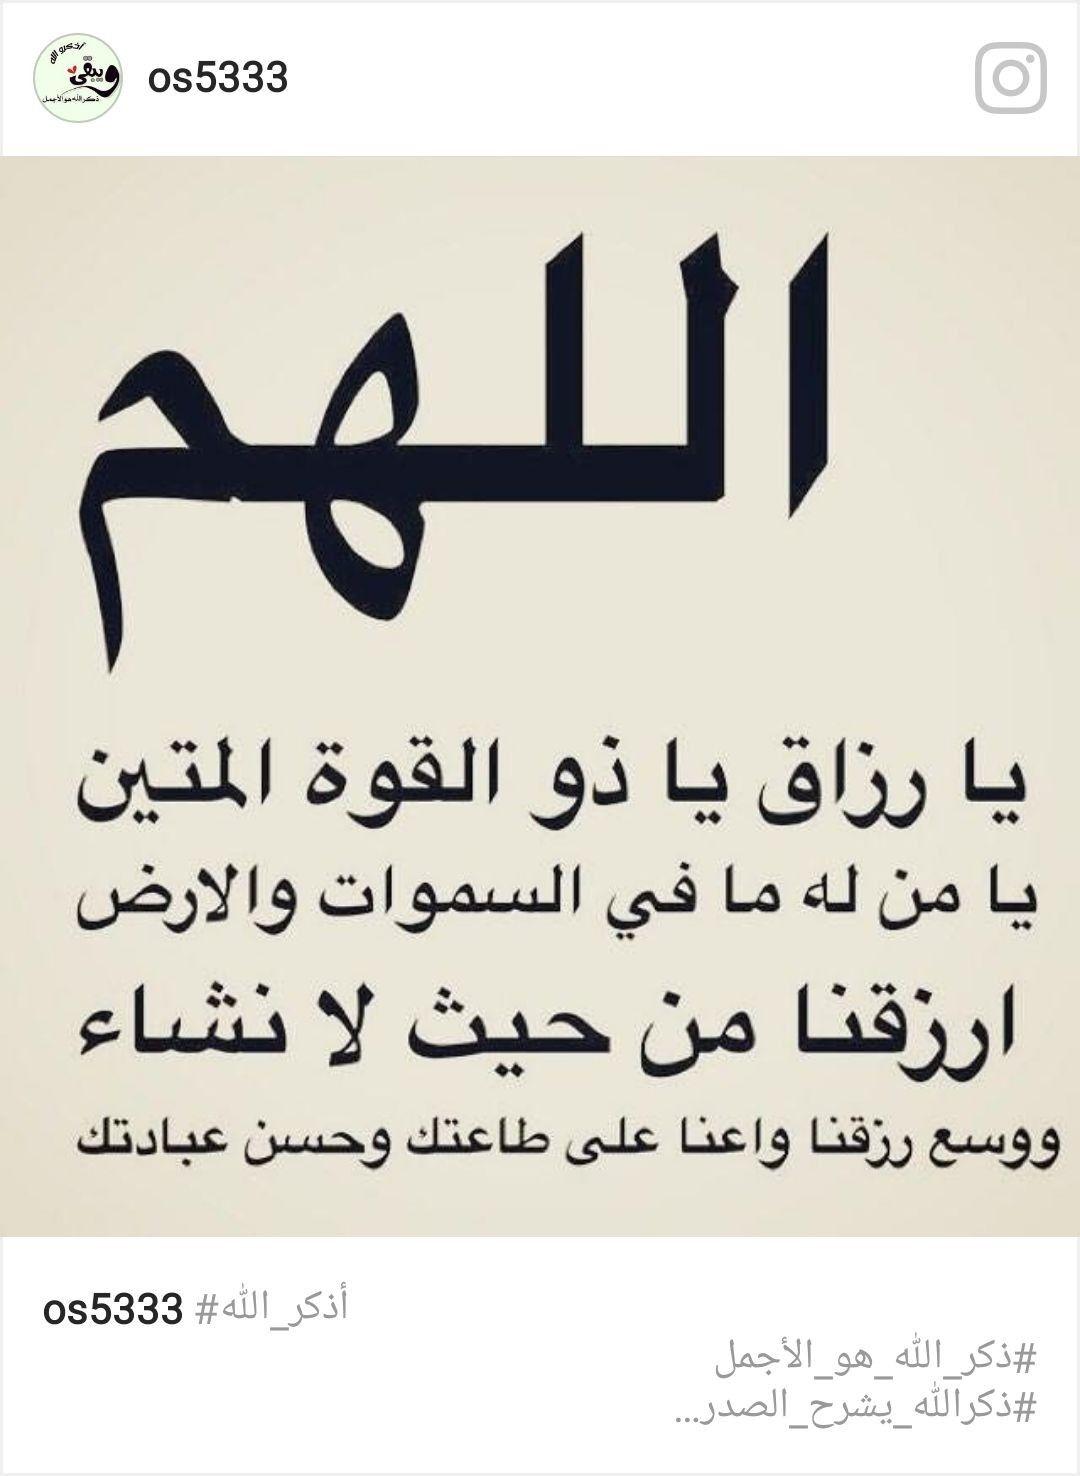 Pin By Rayanuria On دعاء إلى رب غفور Quotes Words Islam Quran